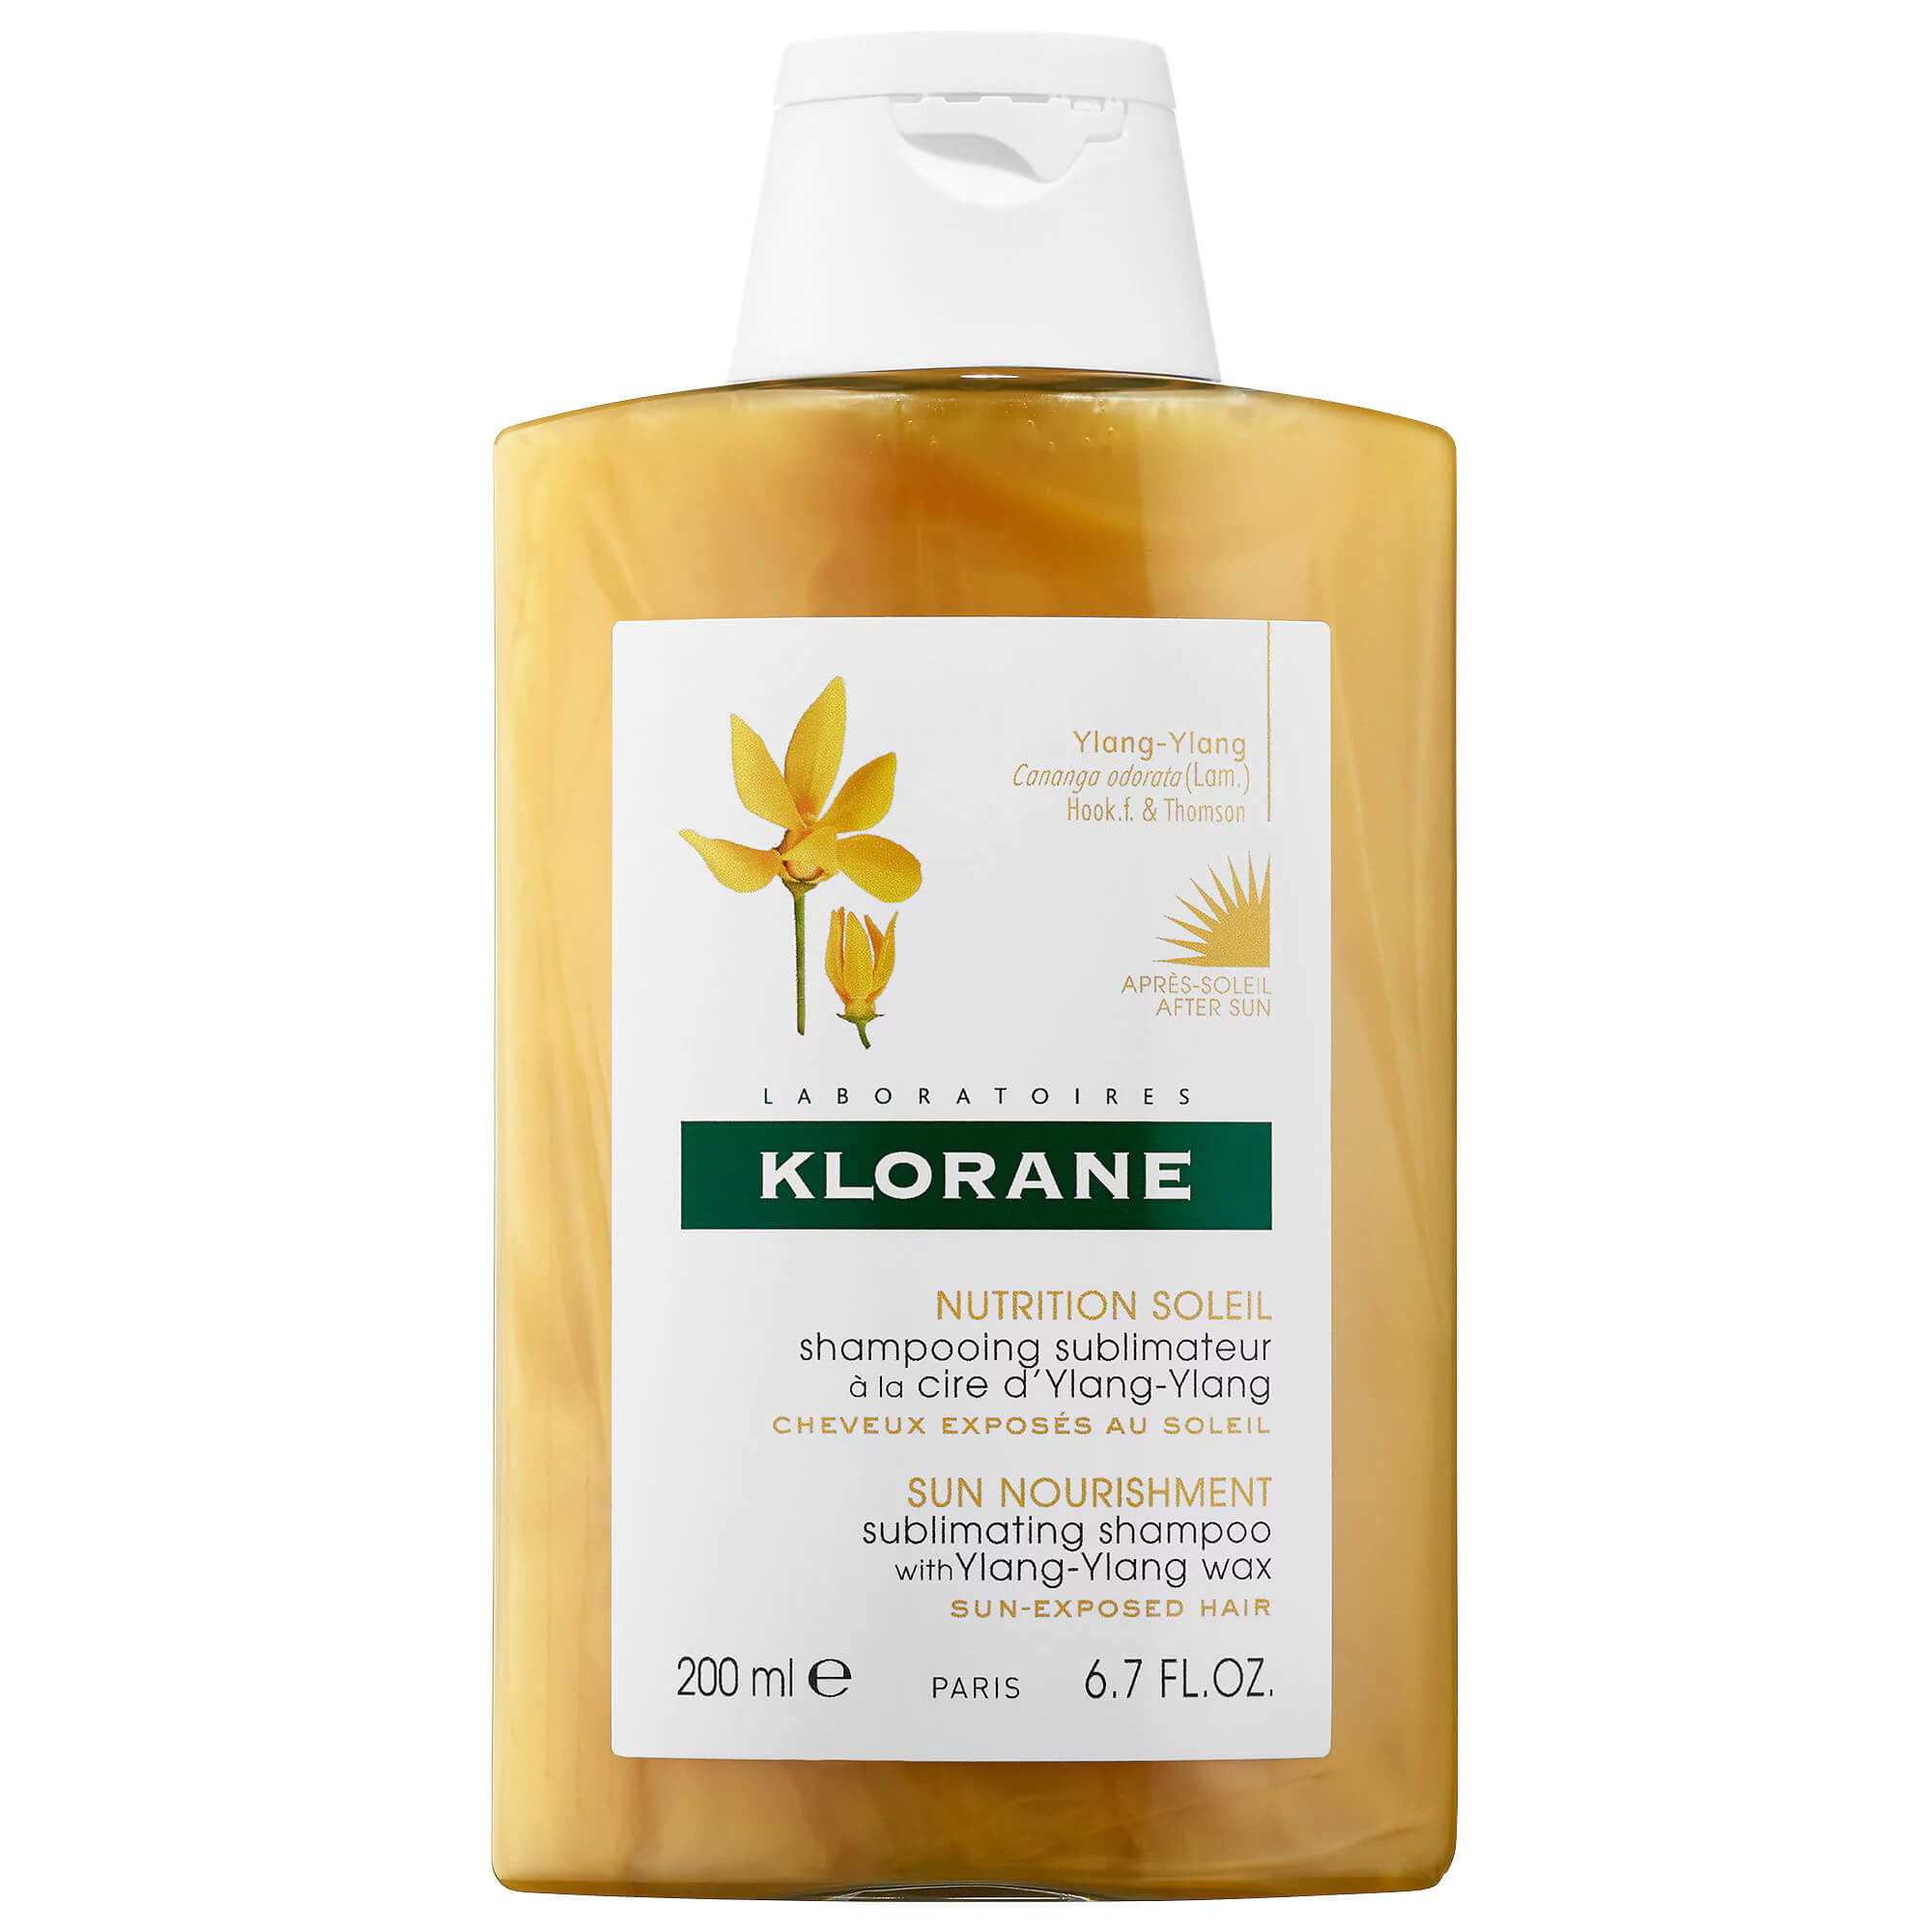 Klorane Shampoo Soin Soleil Ylang Ylang Σαμπουάν Αναδόμησης για Θρέψη & Επανόρθωση Μετά την Έκθεση στον Ήλιο 200ml